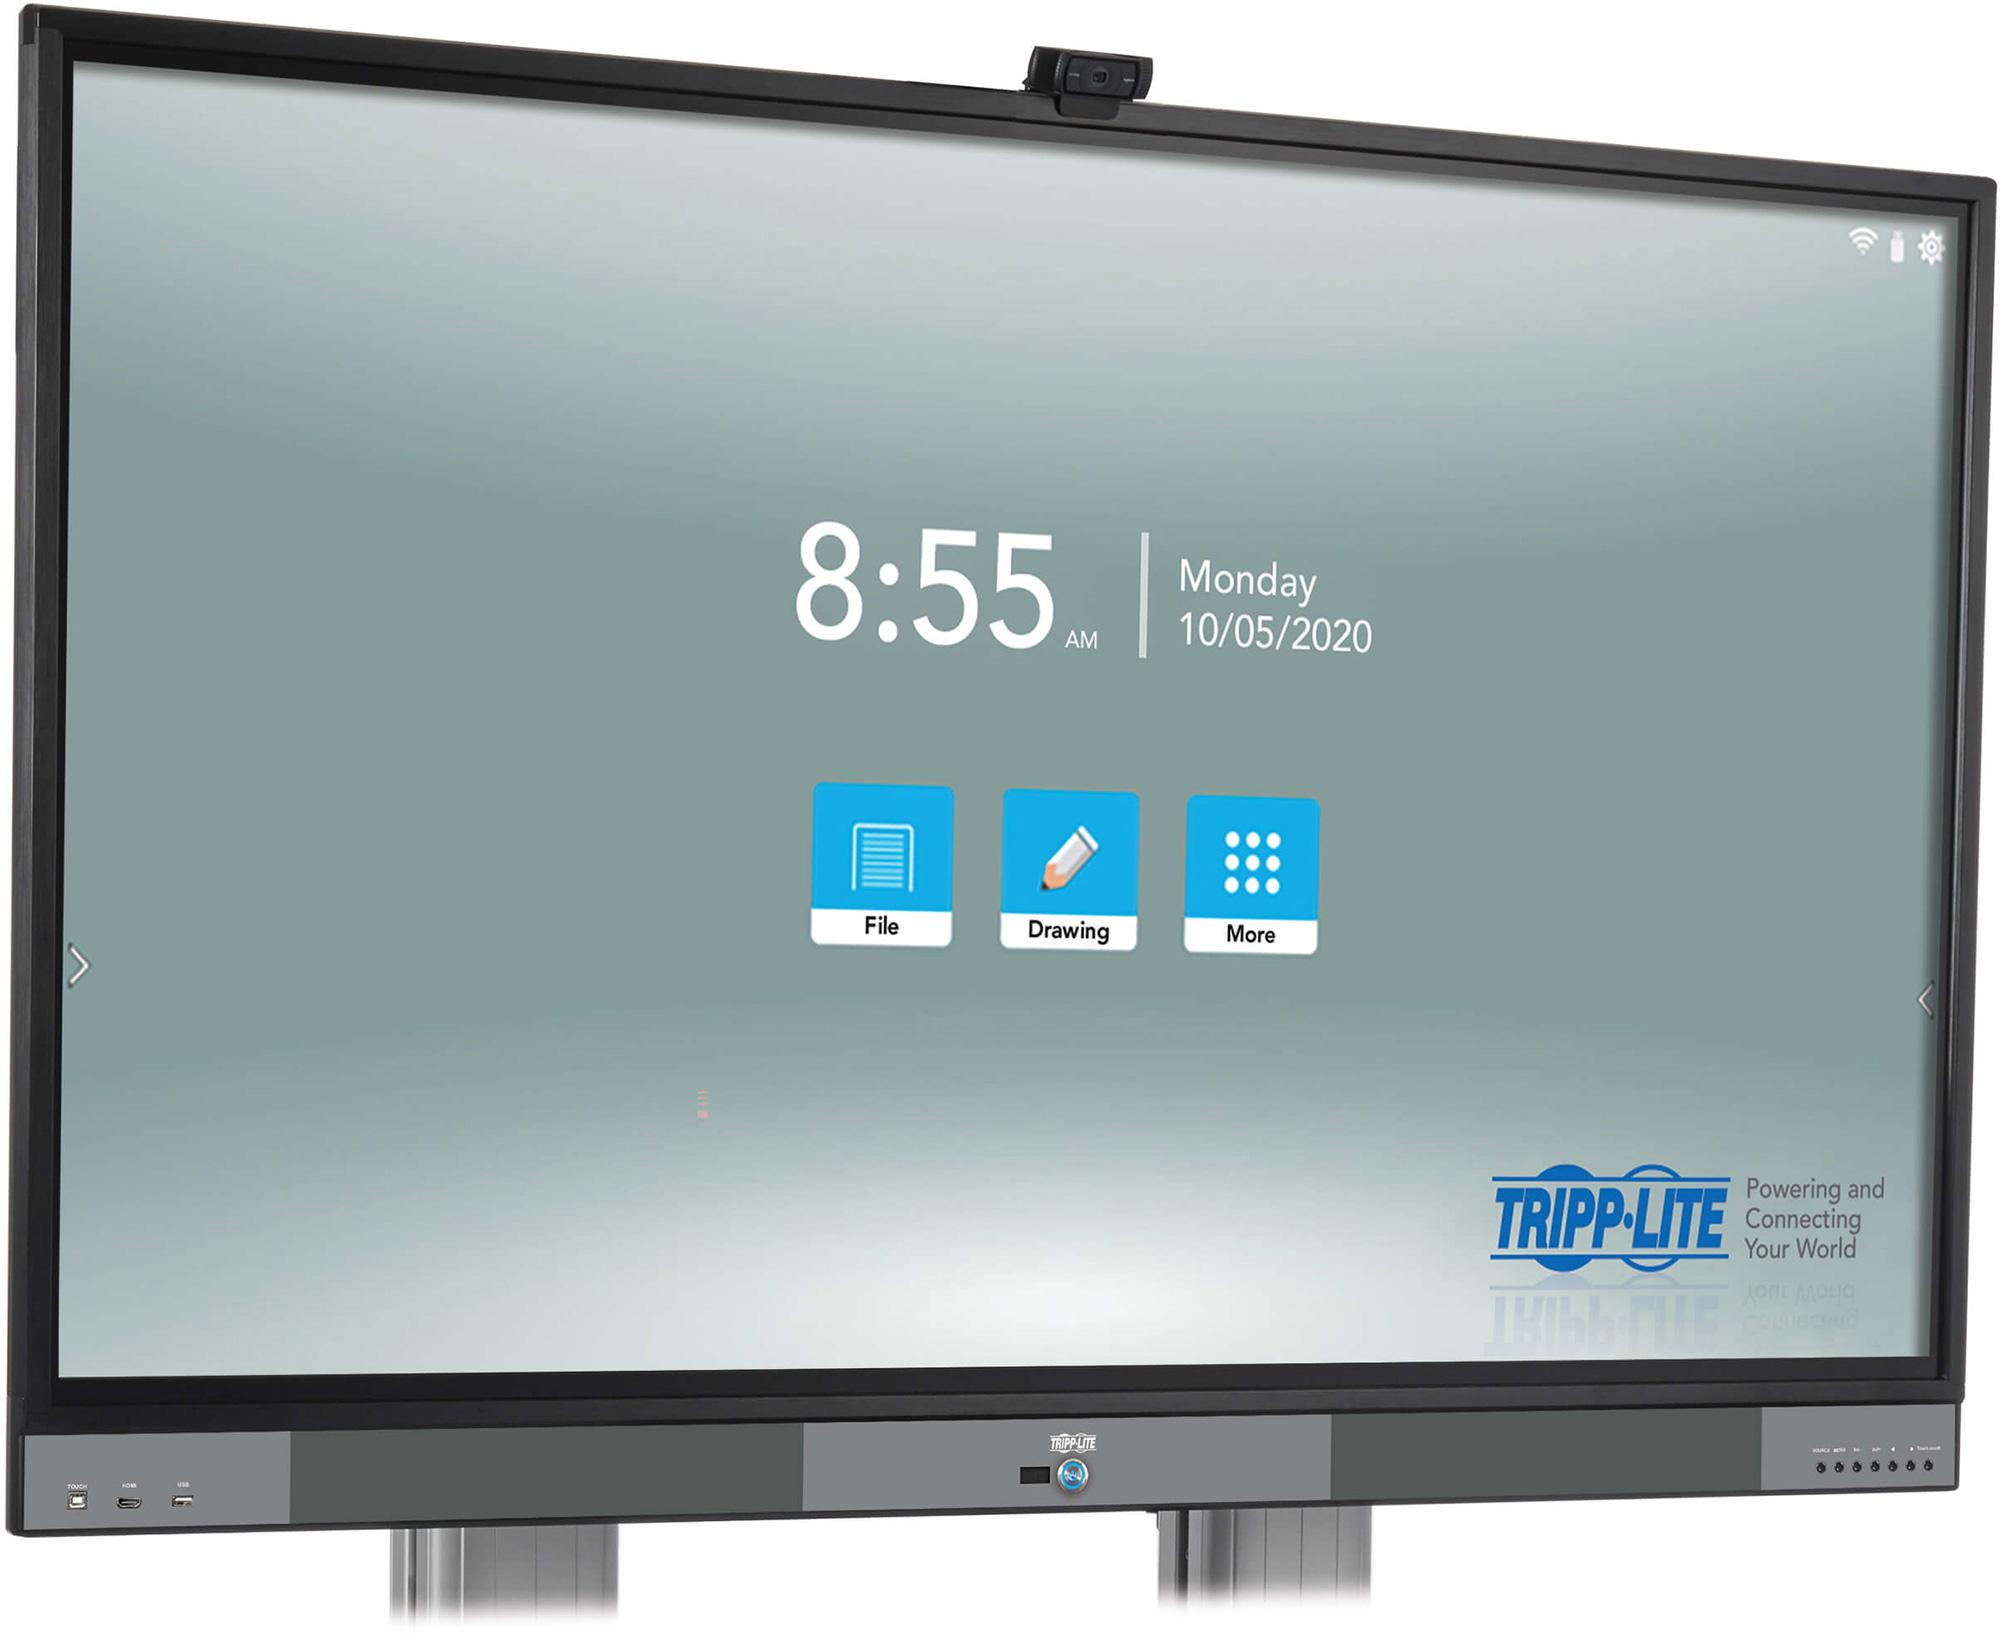 Tripp Lite DMTP55NO Interactive Flat-Panel Touchscreen Display 4K 60Hz UHD - 55 Inch TRL-DMTP55NO